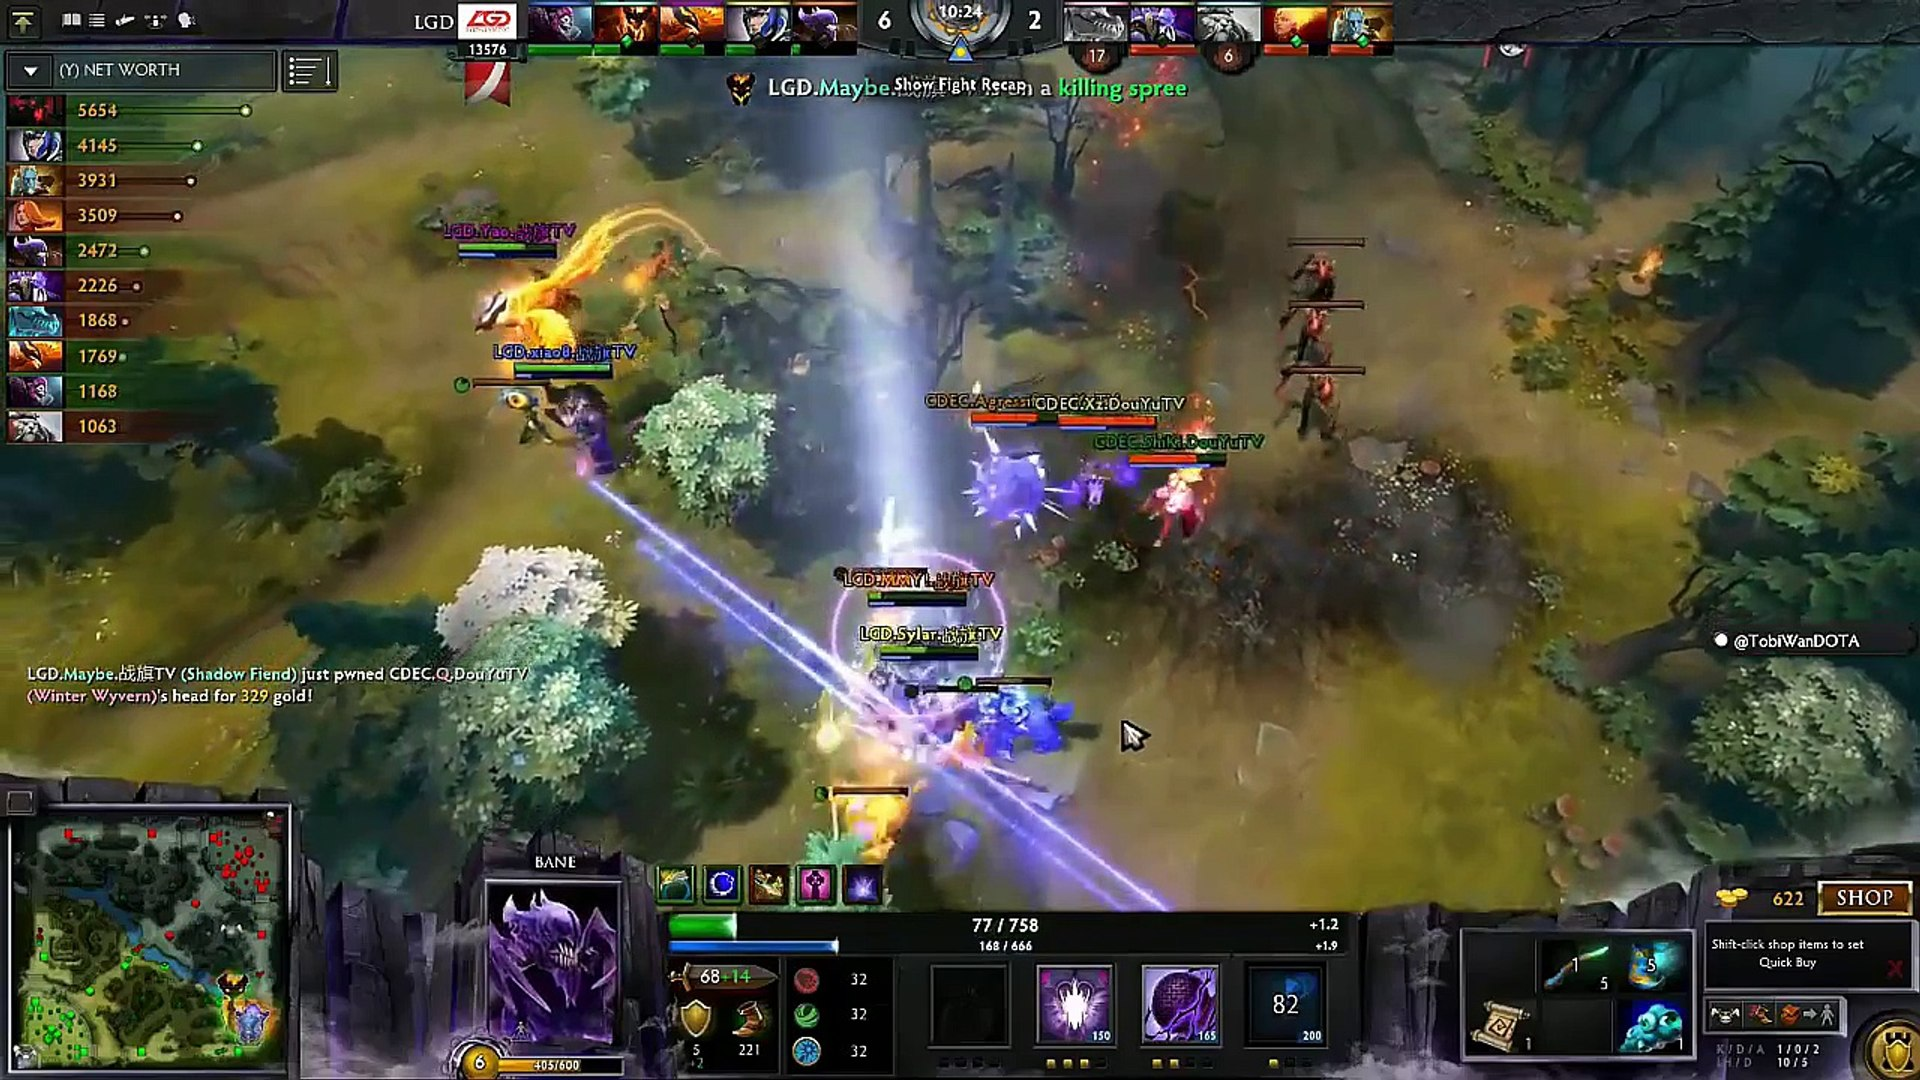 LGD-GAMING vs CDEC Gaming - Ti5 highlight Main Event